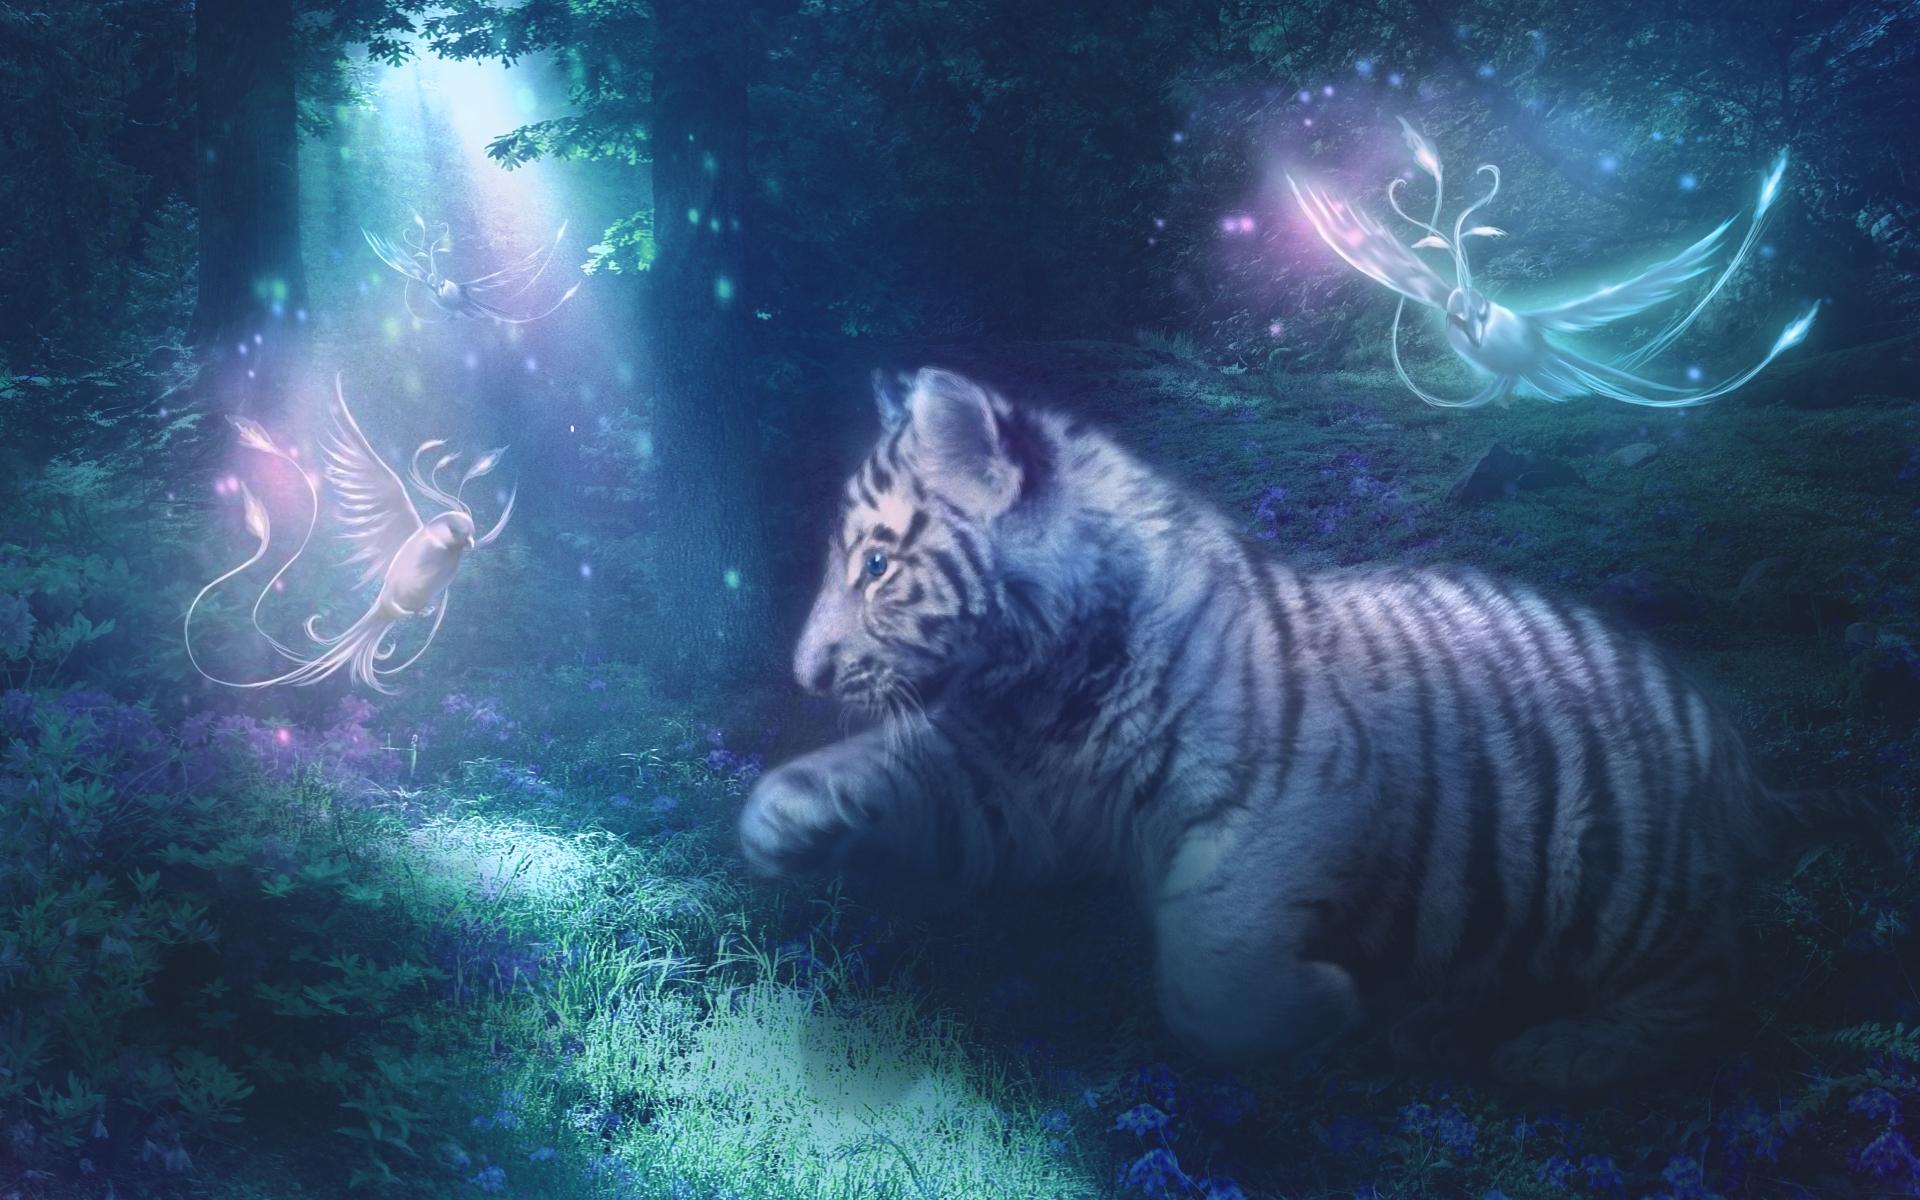 Citaten Uit Engels : Fantasie tiger wallpaper